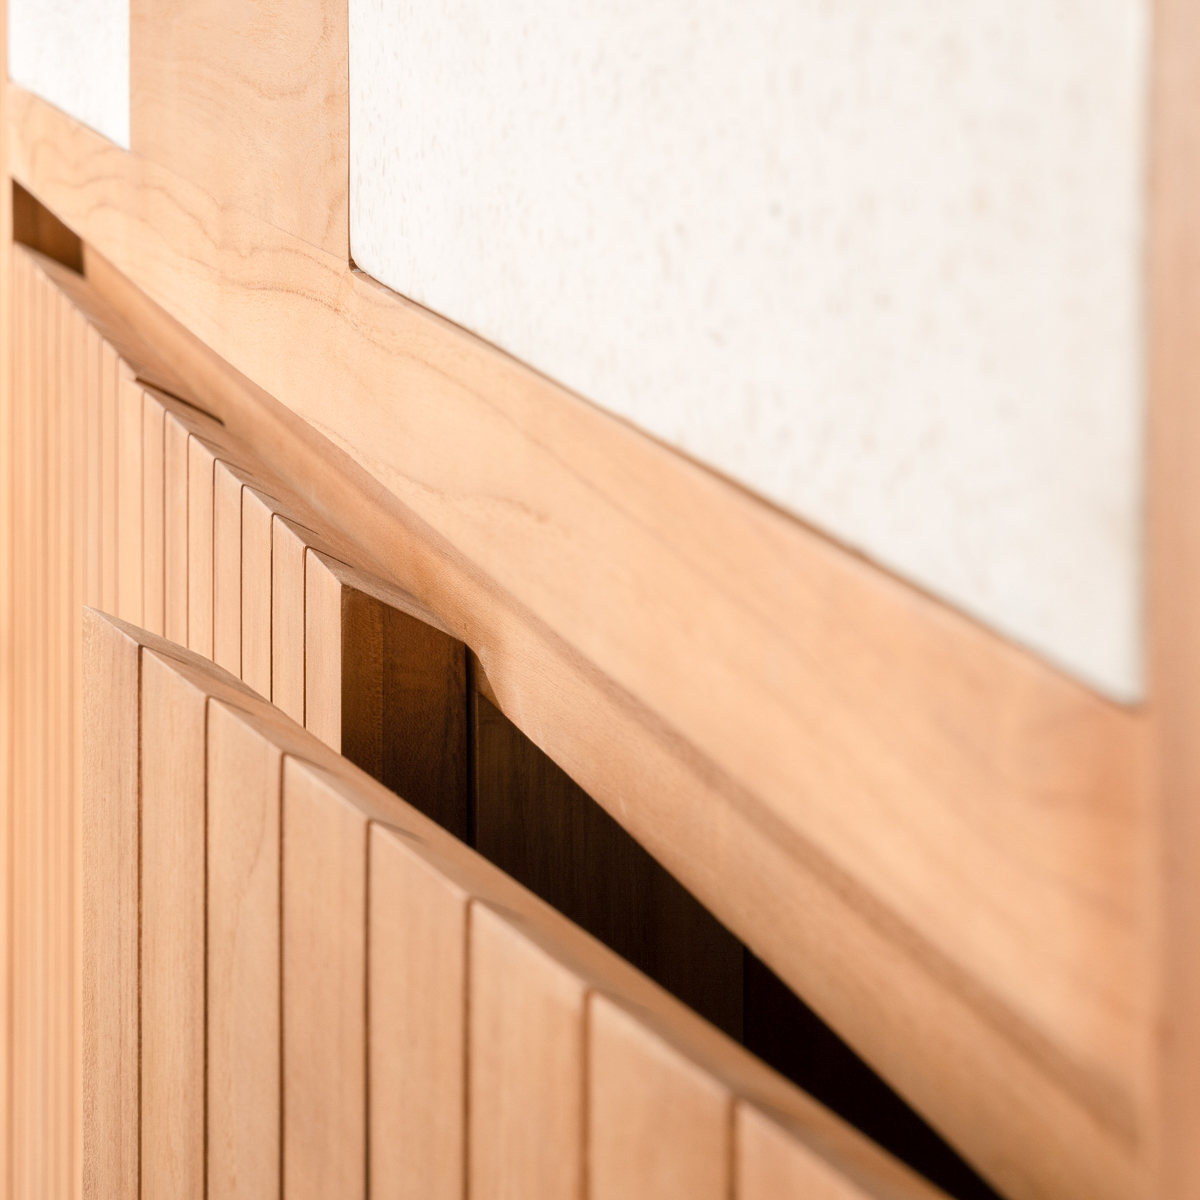 meuble sous vasque double vasque en bois teck massif 2 vasque en terrazzo luxe naturel. Black Bedroom Furniture Sets. Home Design Ideas